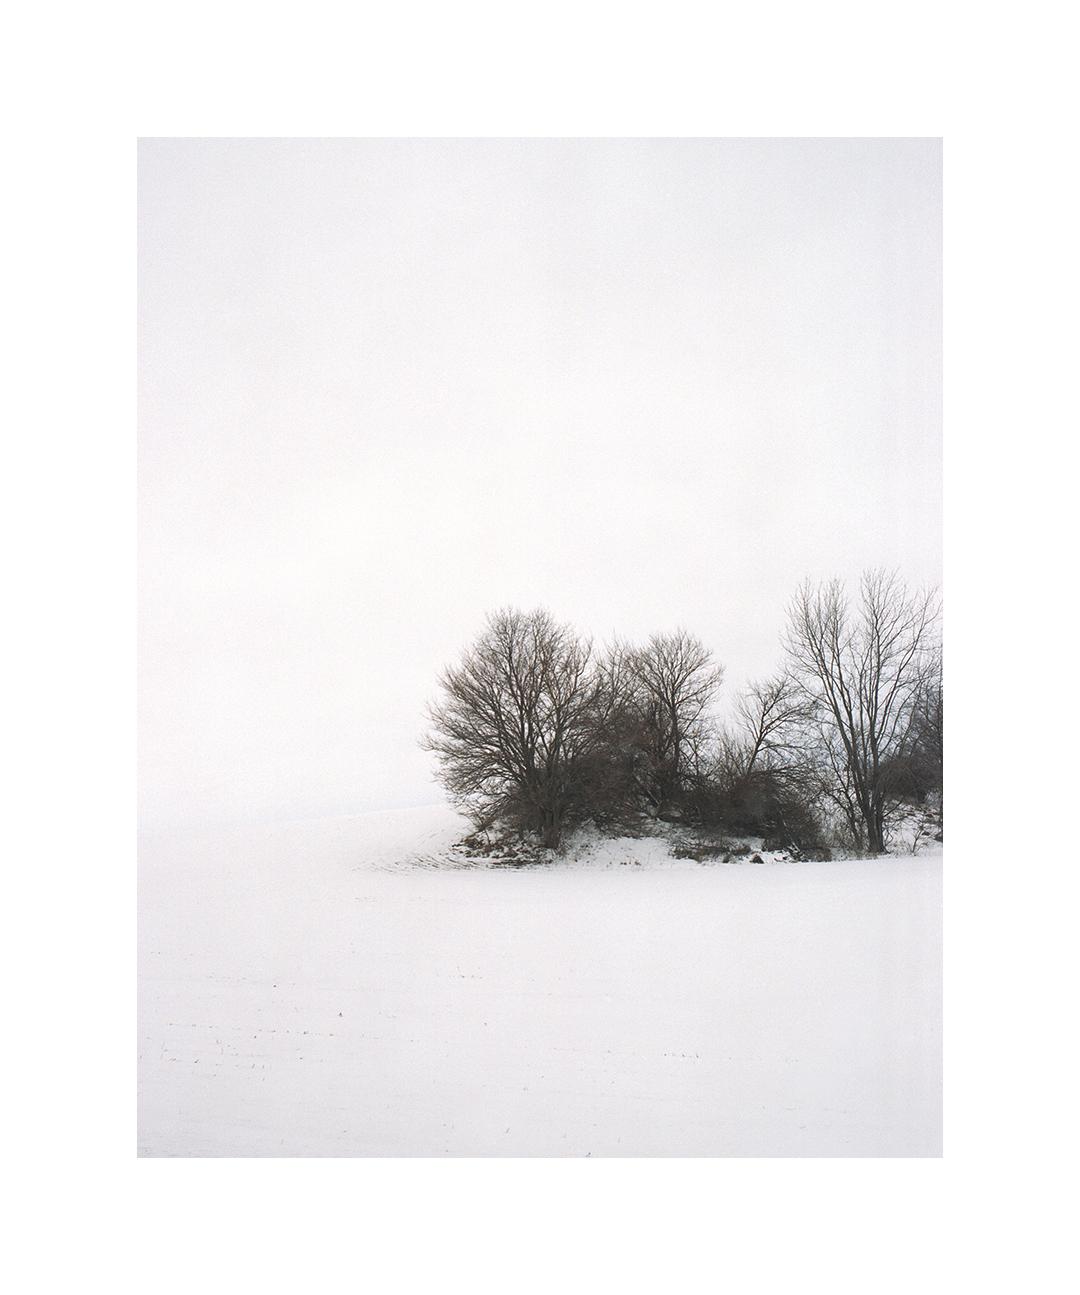 landscapev_0202.jpg